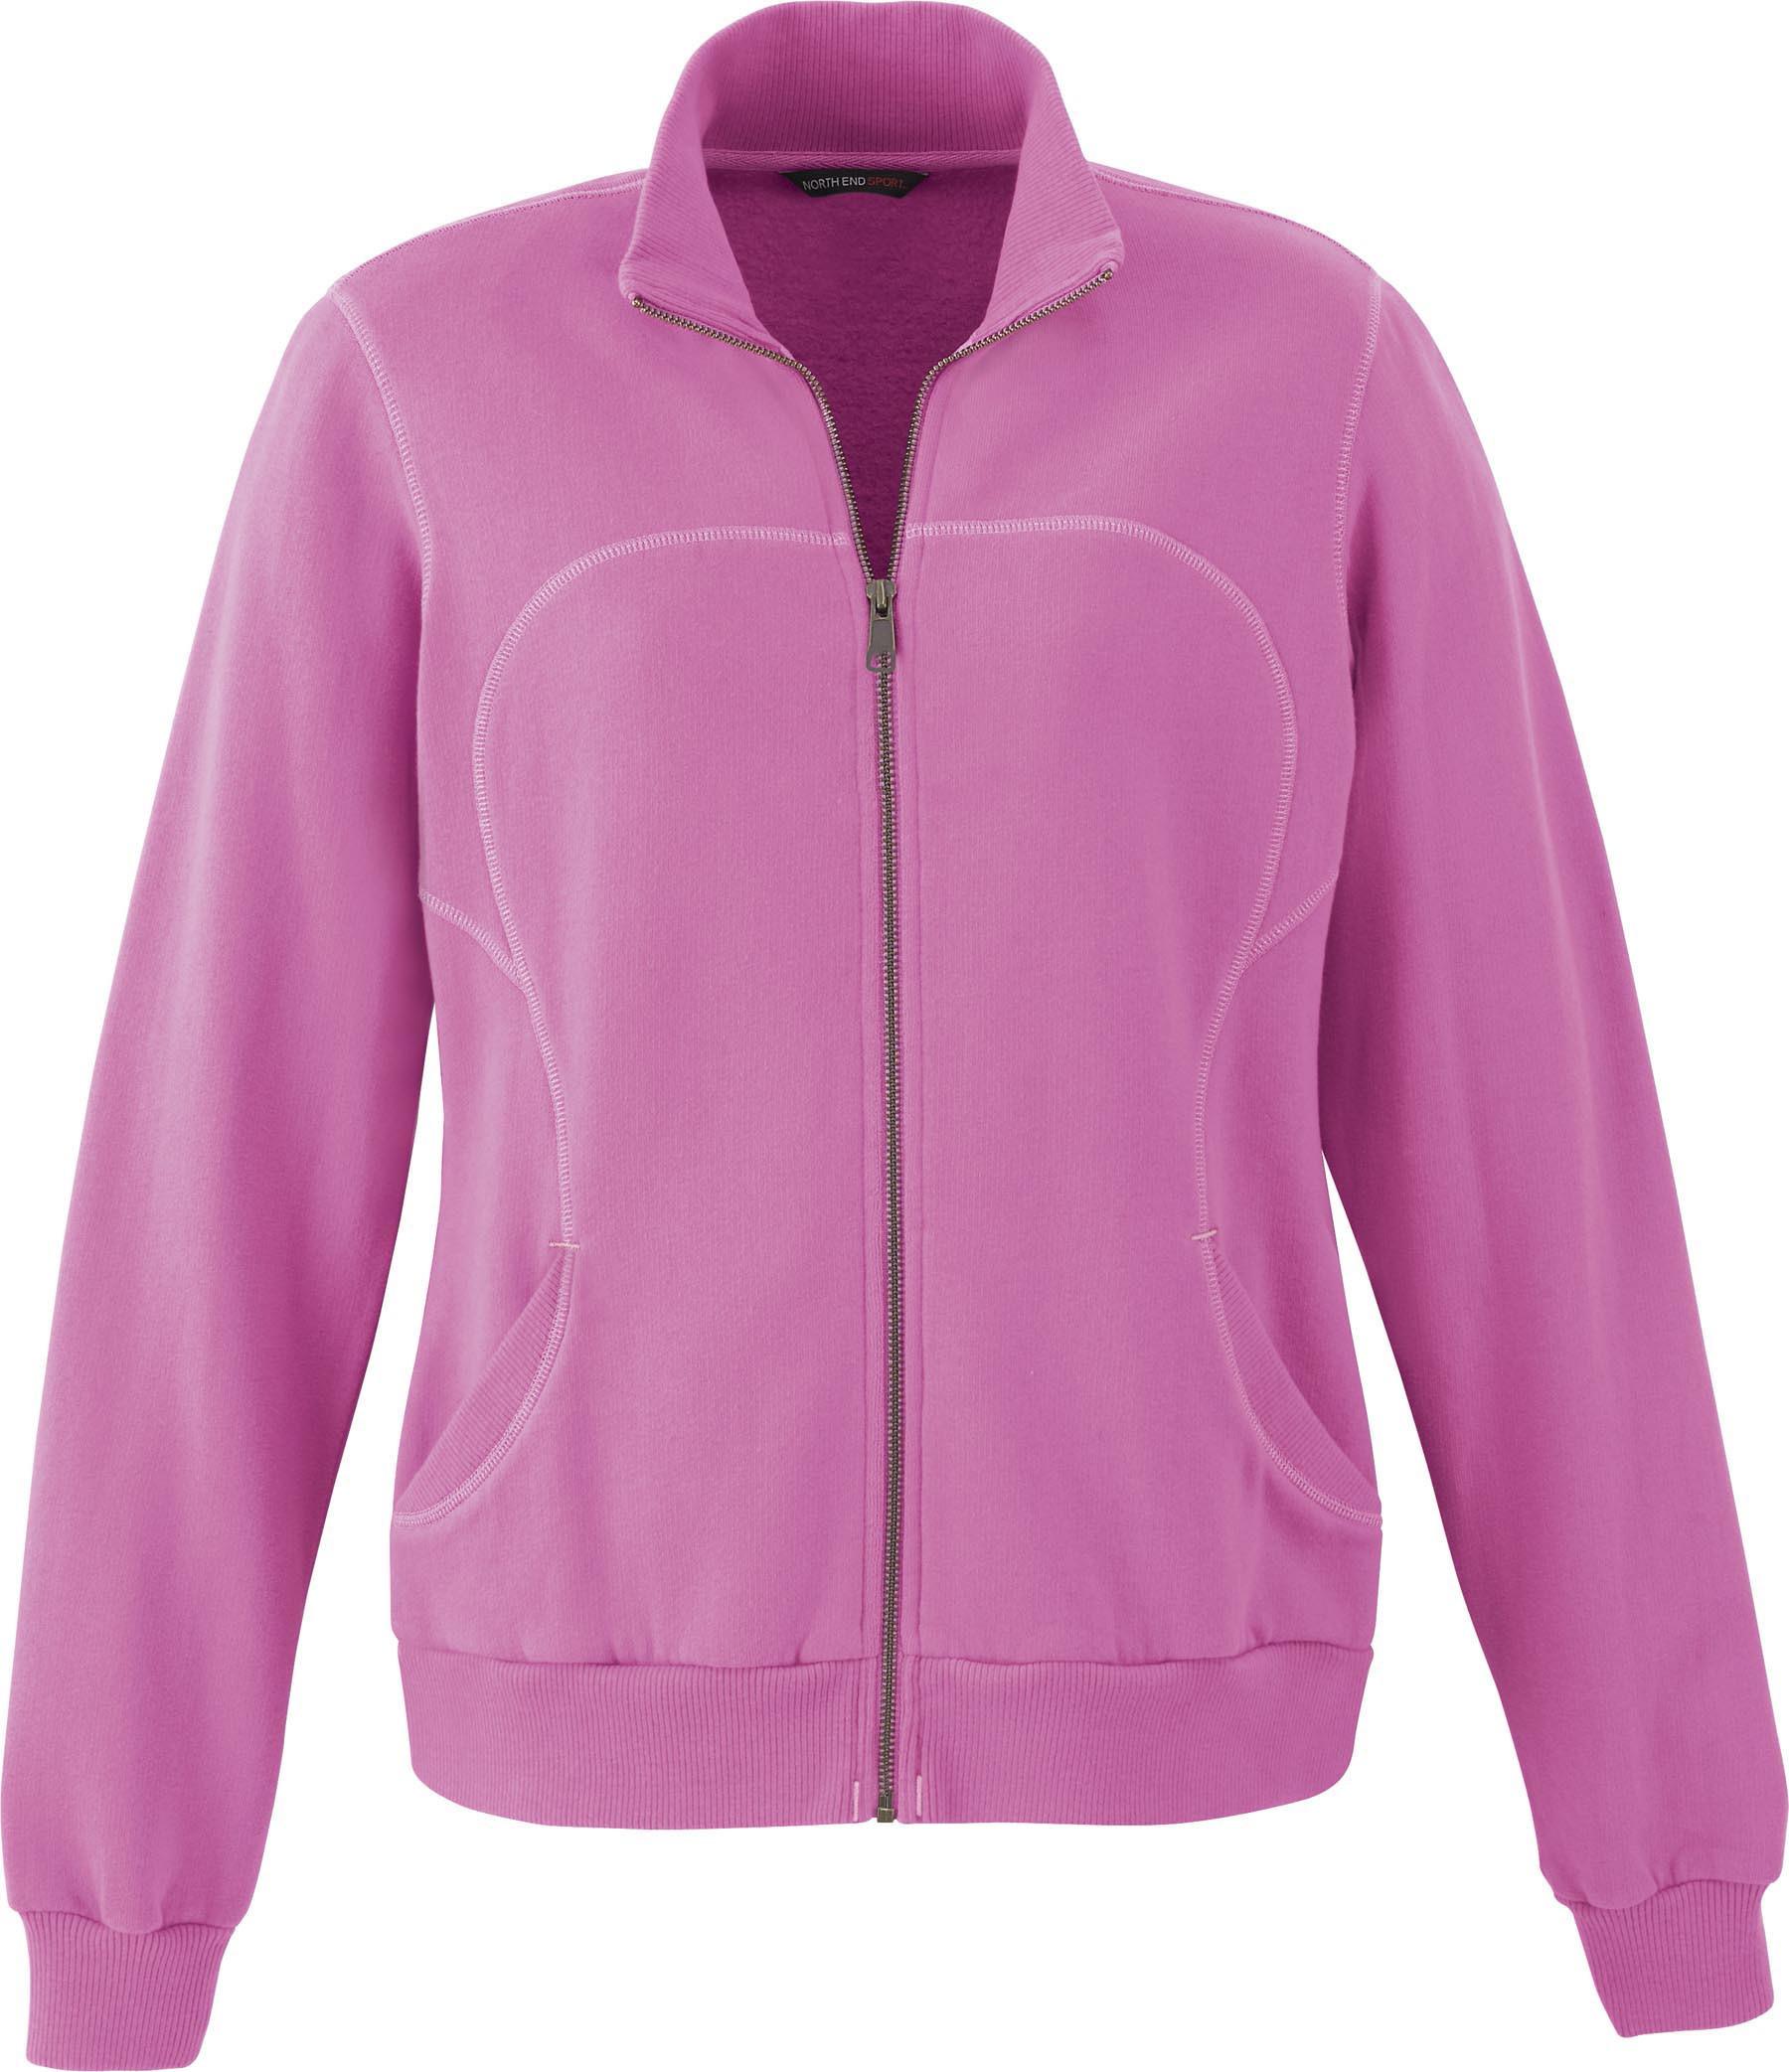 Ash City Cotton/Poly Fleece 78642 - Ladies' Cotton Polyester ...